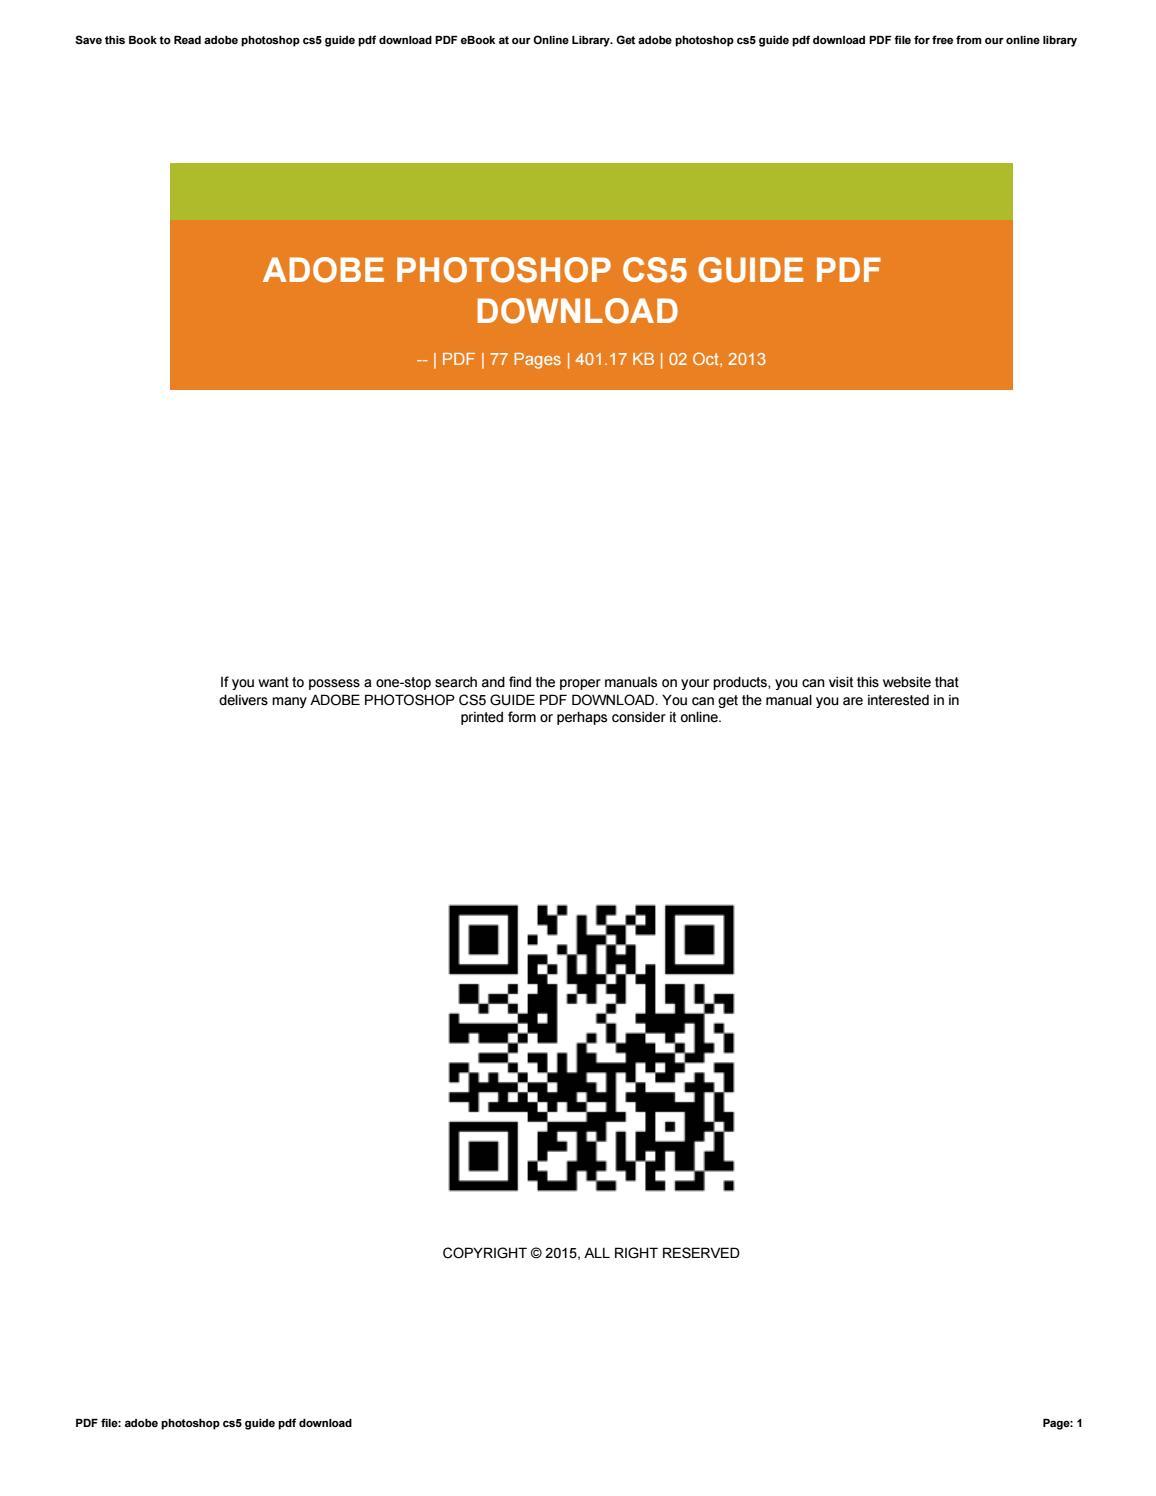 adobe photoshop cs5 guide pdf download by poliy76bydta issuu rh issuu com Adobe Photoshop CS4 Adobe Photoshop CS6 Upgrade